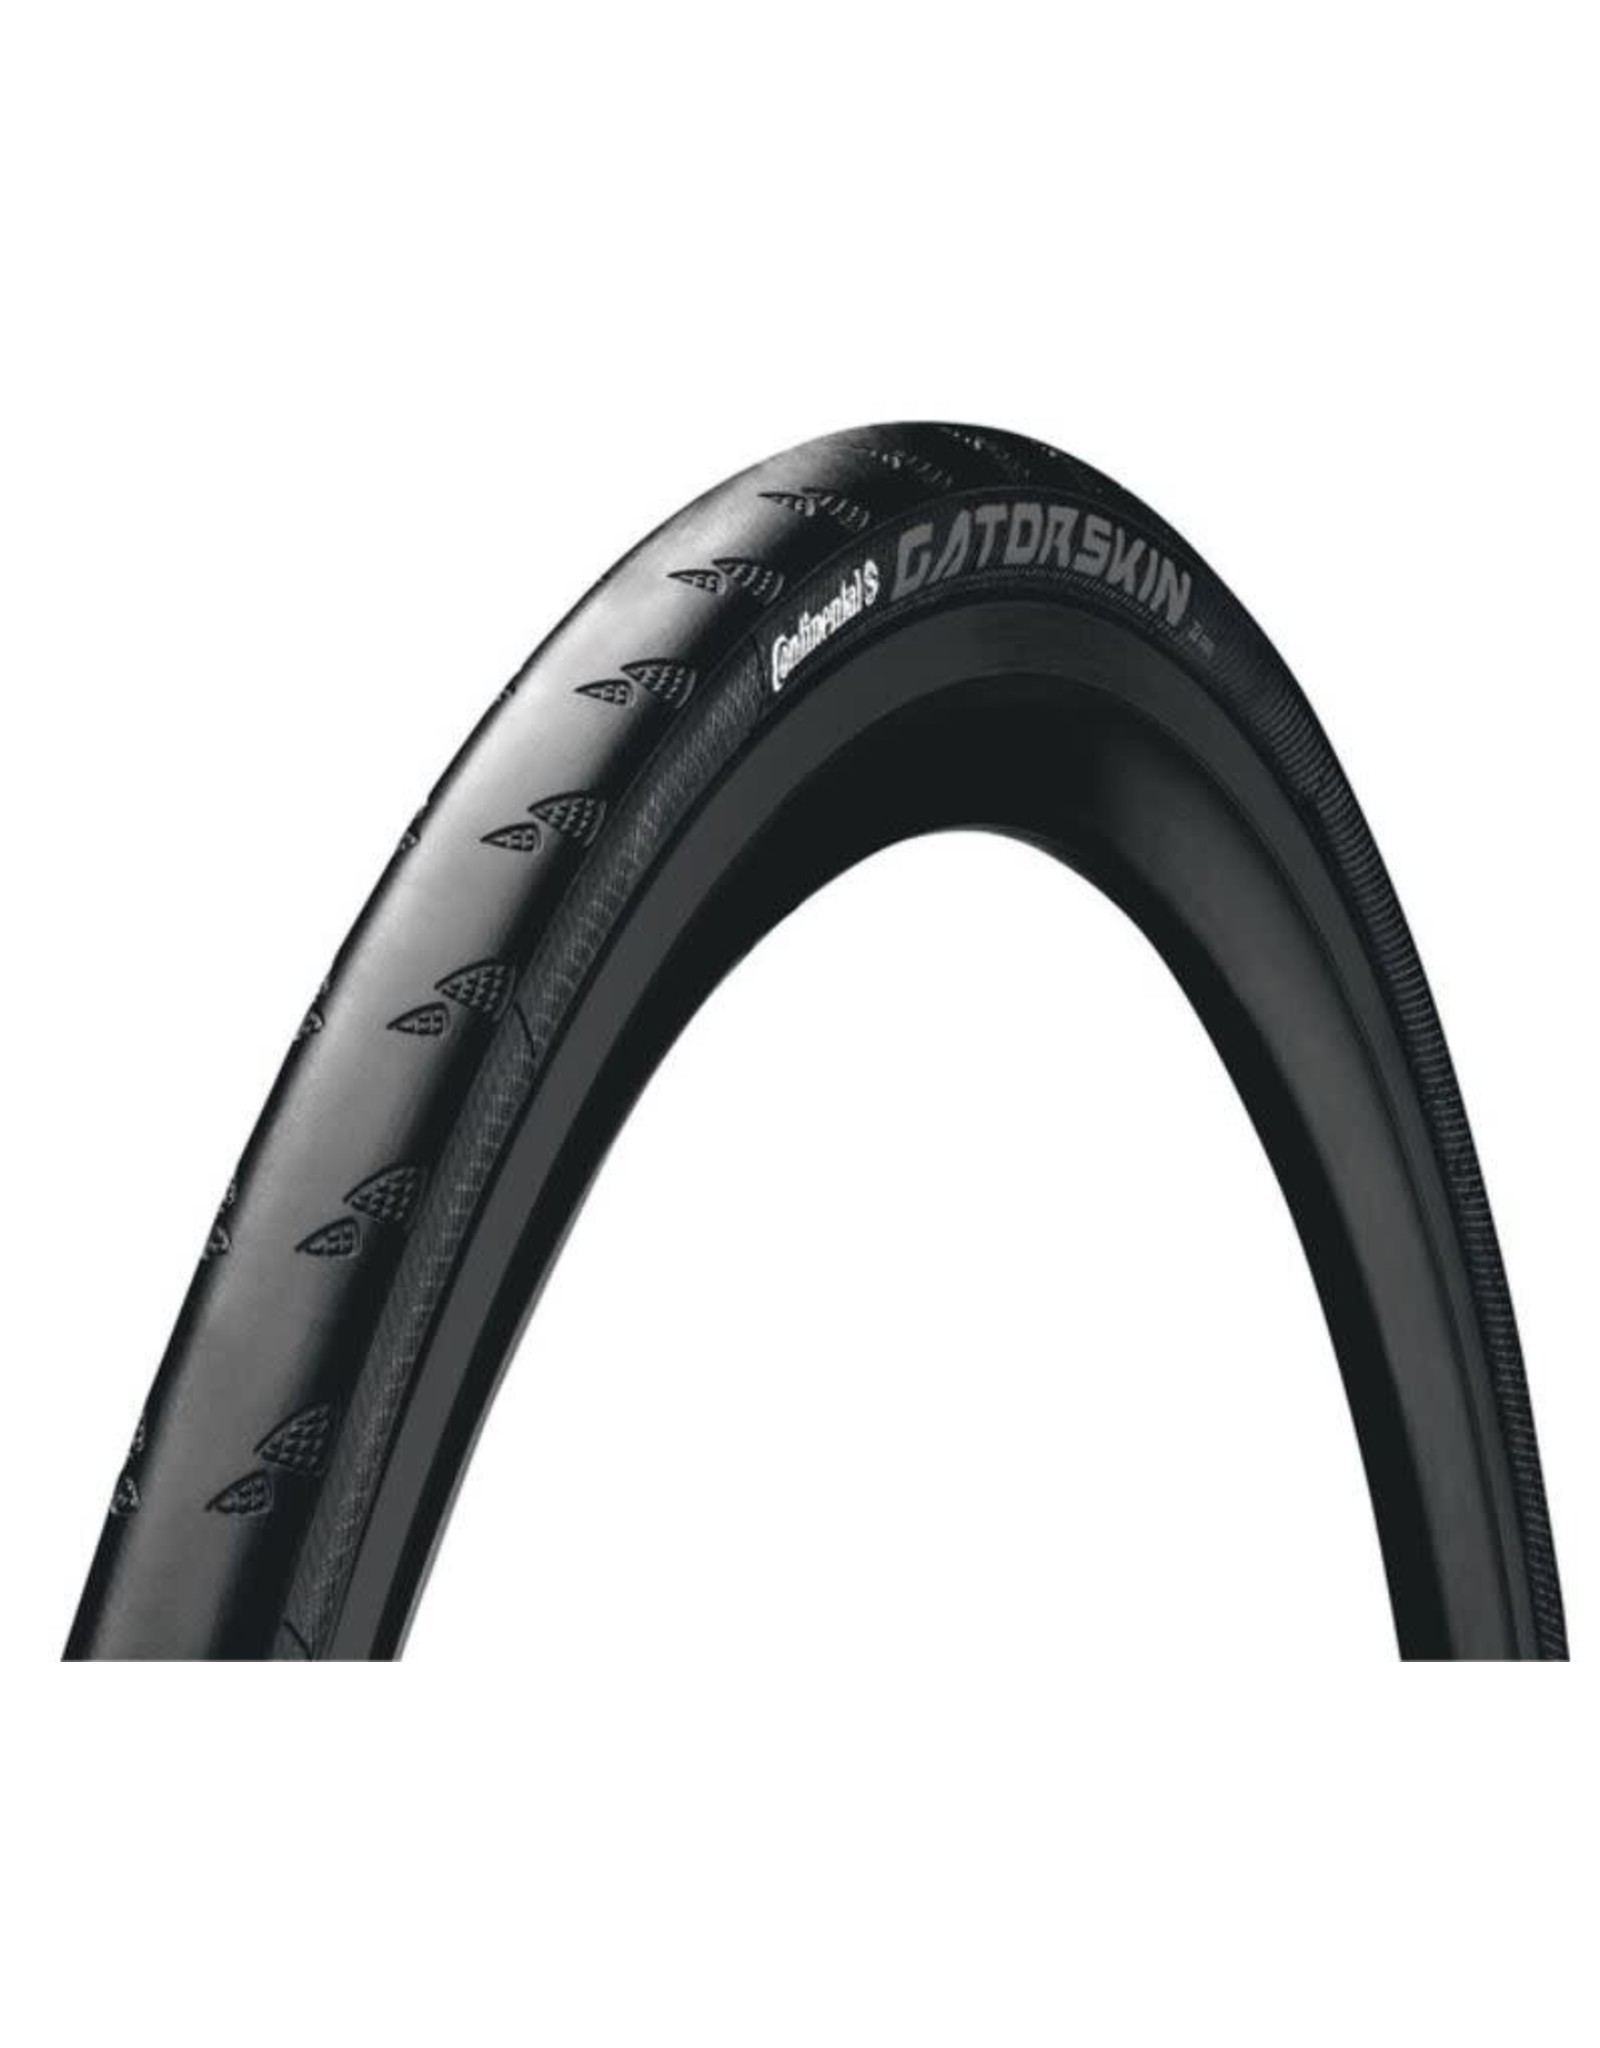 Continental Tire Conti Gatorskin Black Ed. Folding duraskin